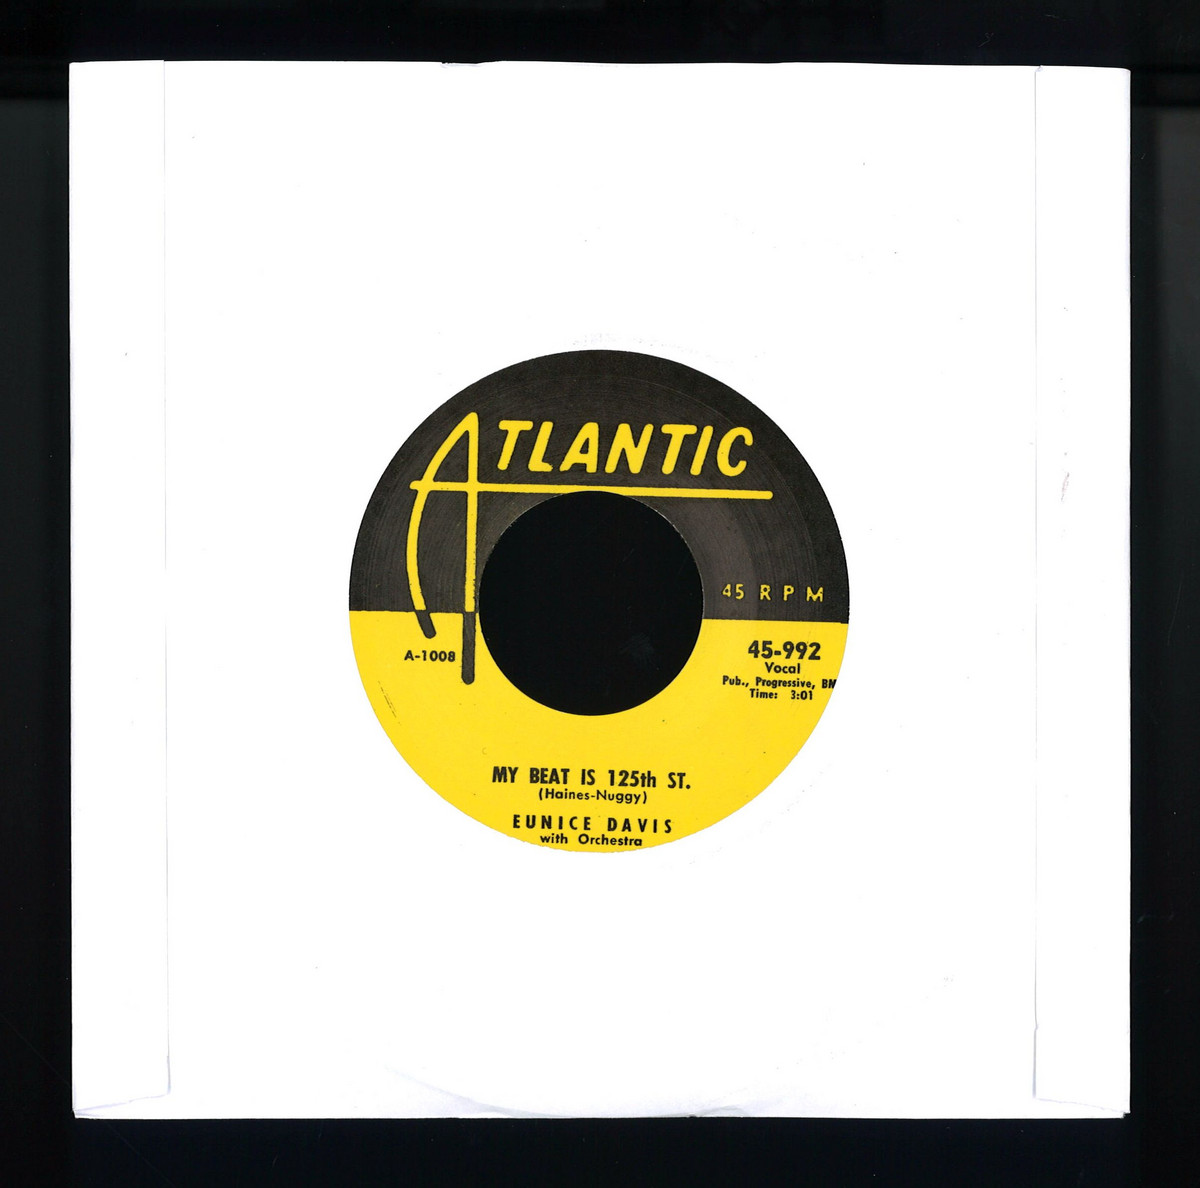 deejay de - Atlantic UK